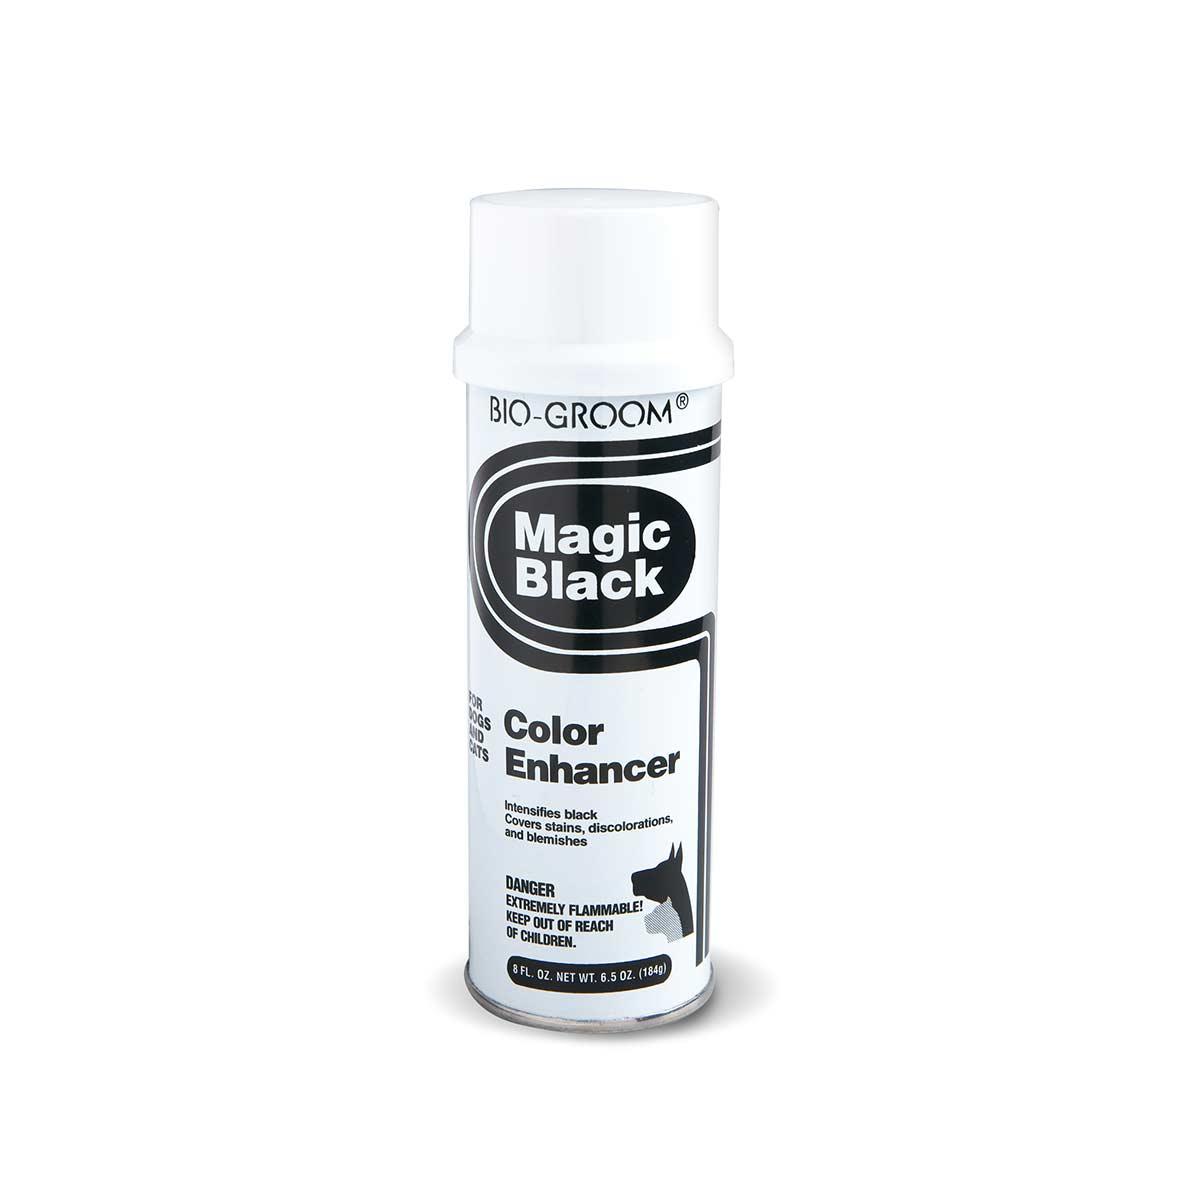 8 oz Bio-Groom Magic Black Color Enhancer for Cats and Dogs